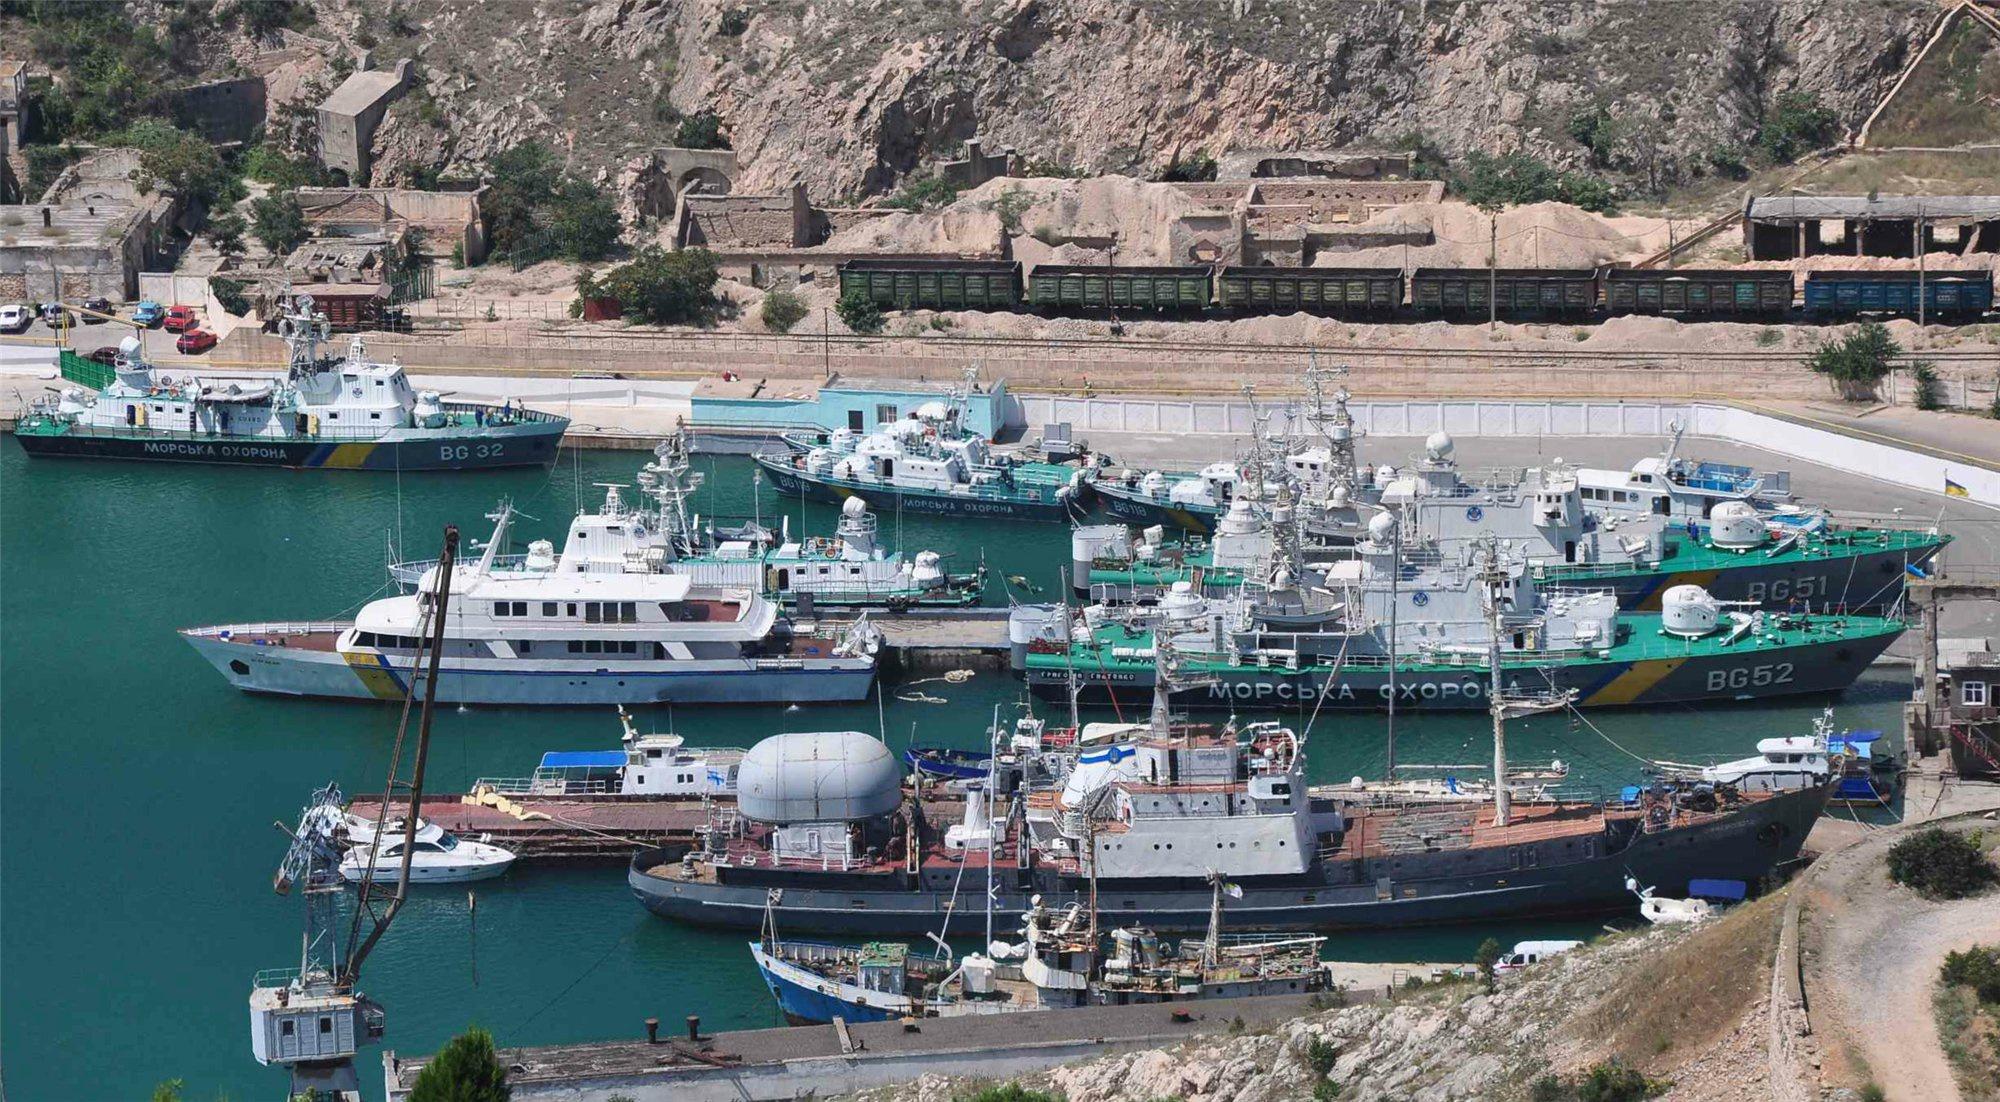 Crimea's integration into Russian Federation: - Page 5 F_czAxOS5yYWRpa2FsLnJ1L2k2MDcvMTUwNy83OS82YmYwNTdjZmY1ZTQuanBnP19faWQ9NjQ4NjE=